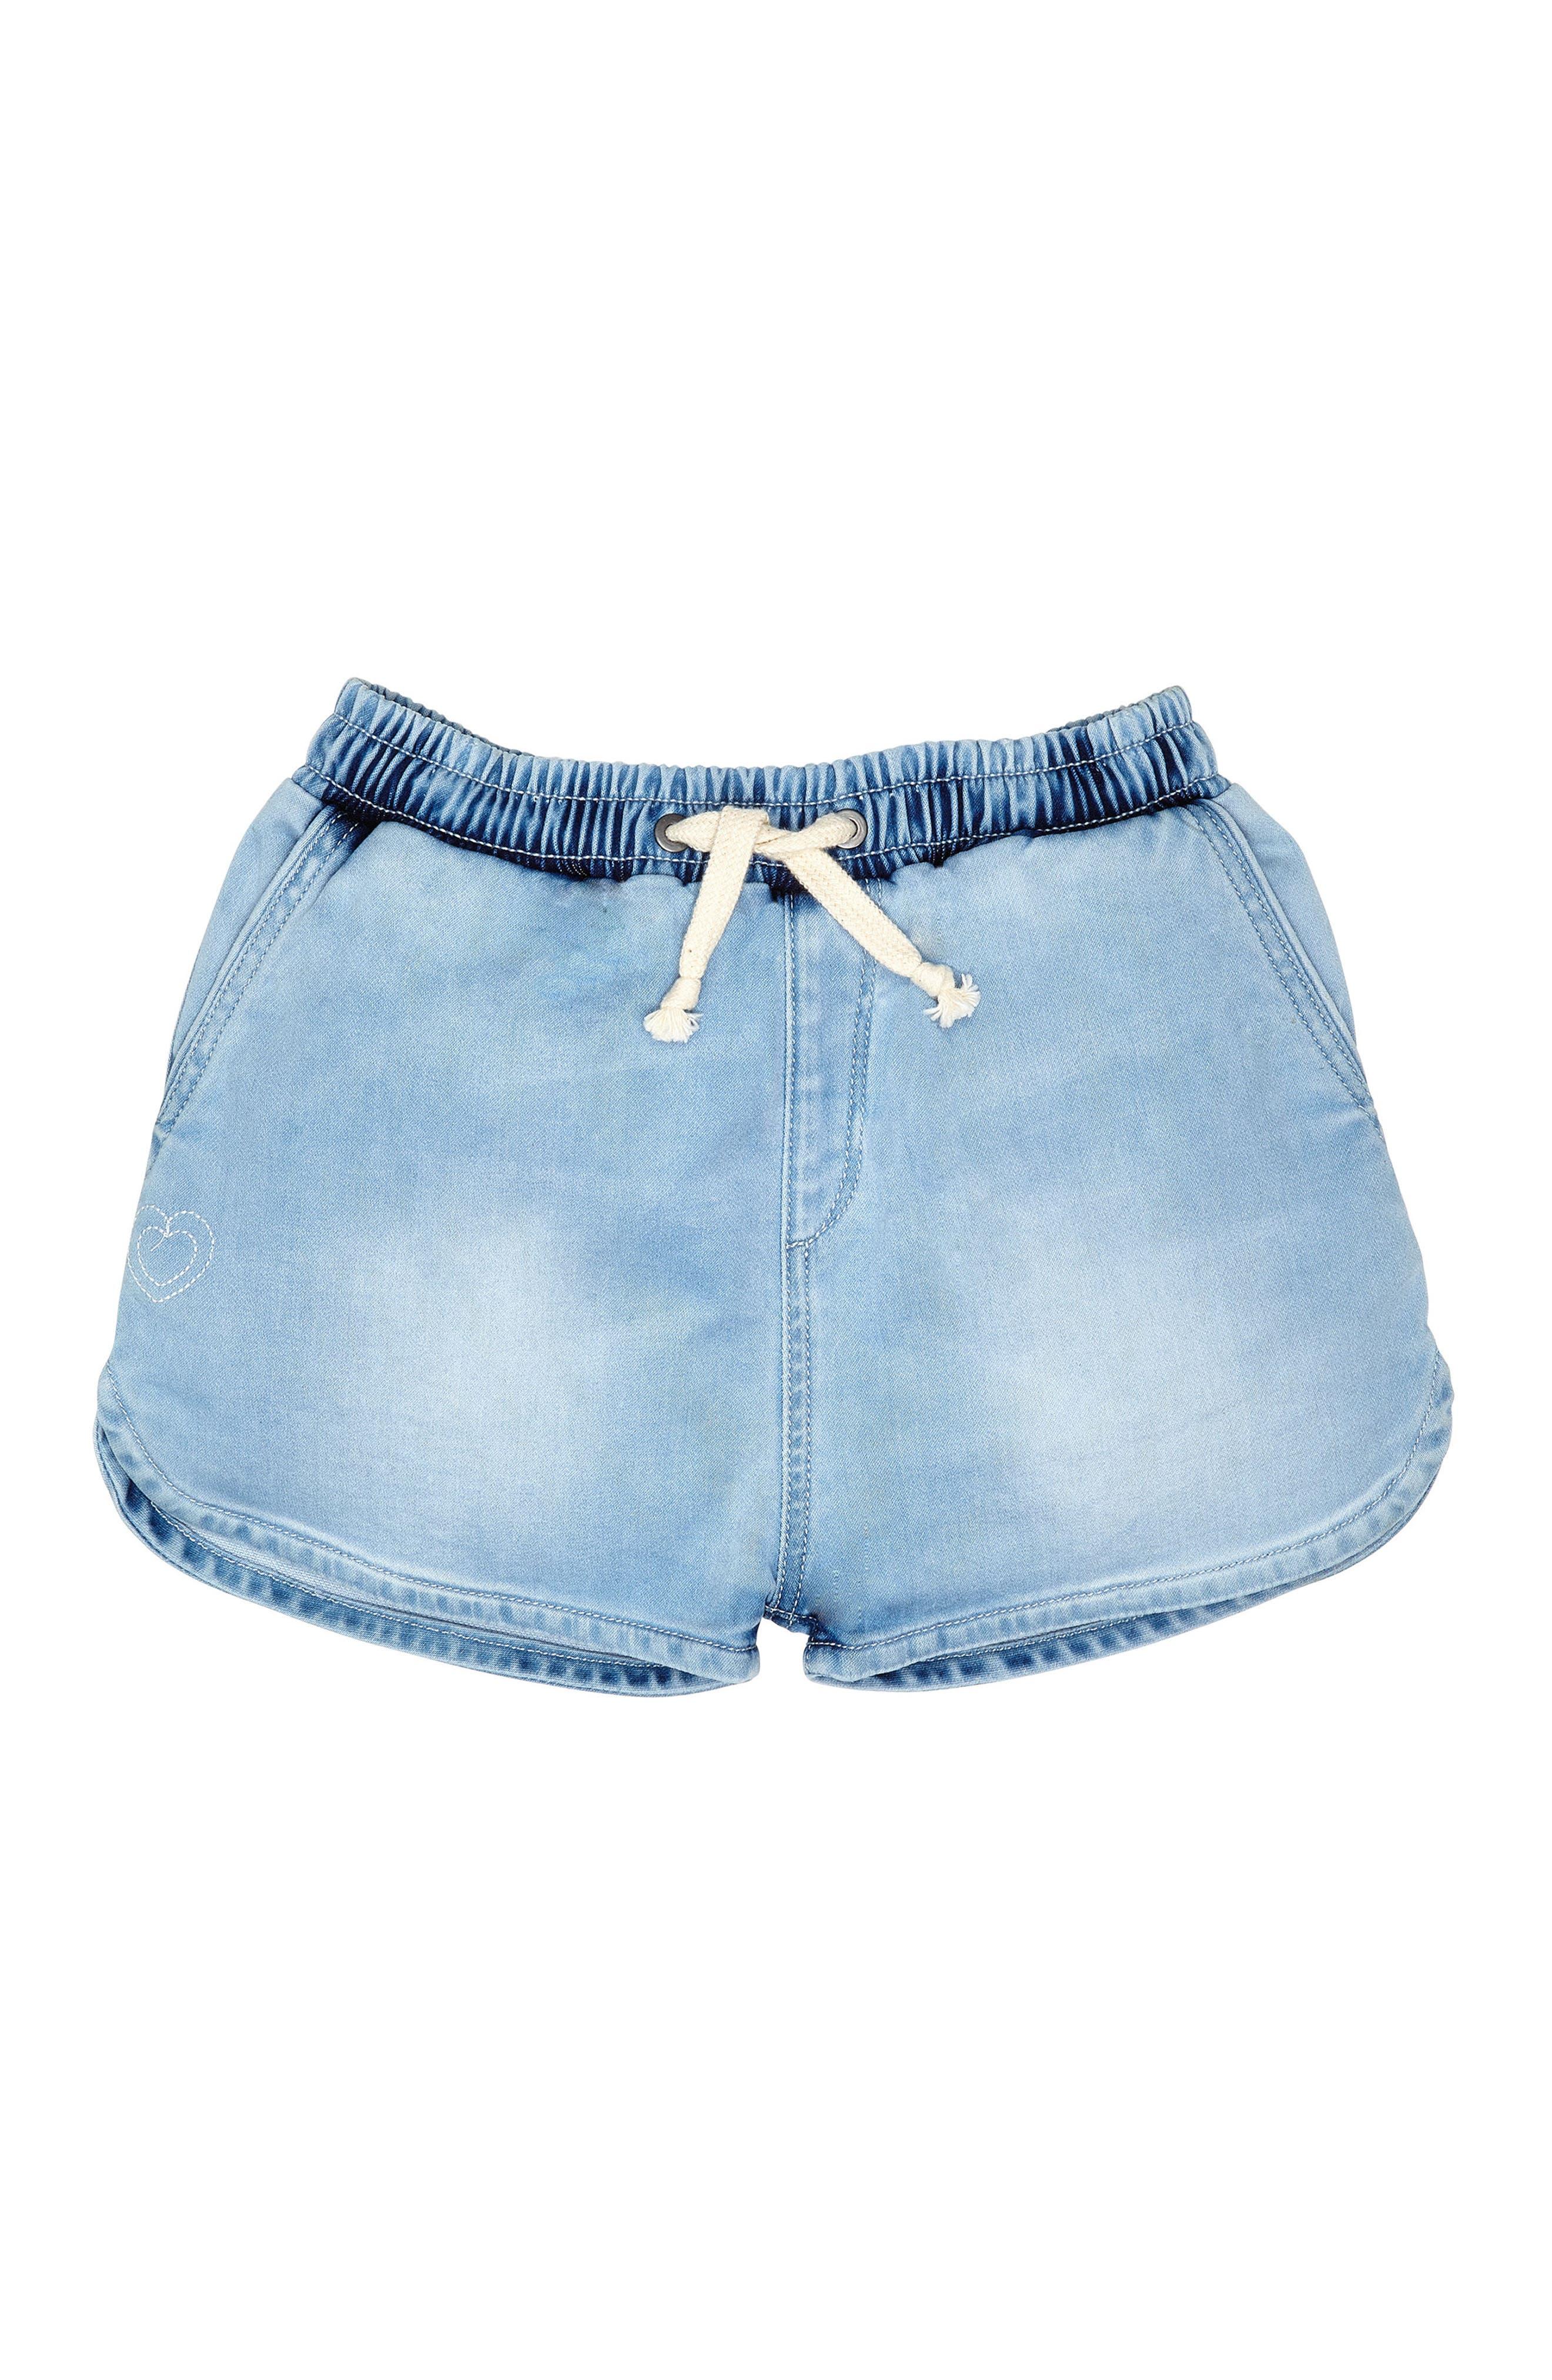 Denim Sport Shorts,                         Main,                         color, Malibu